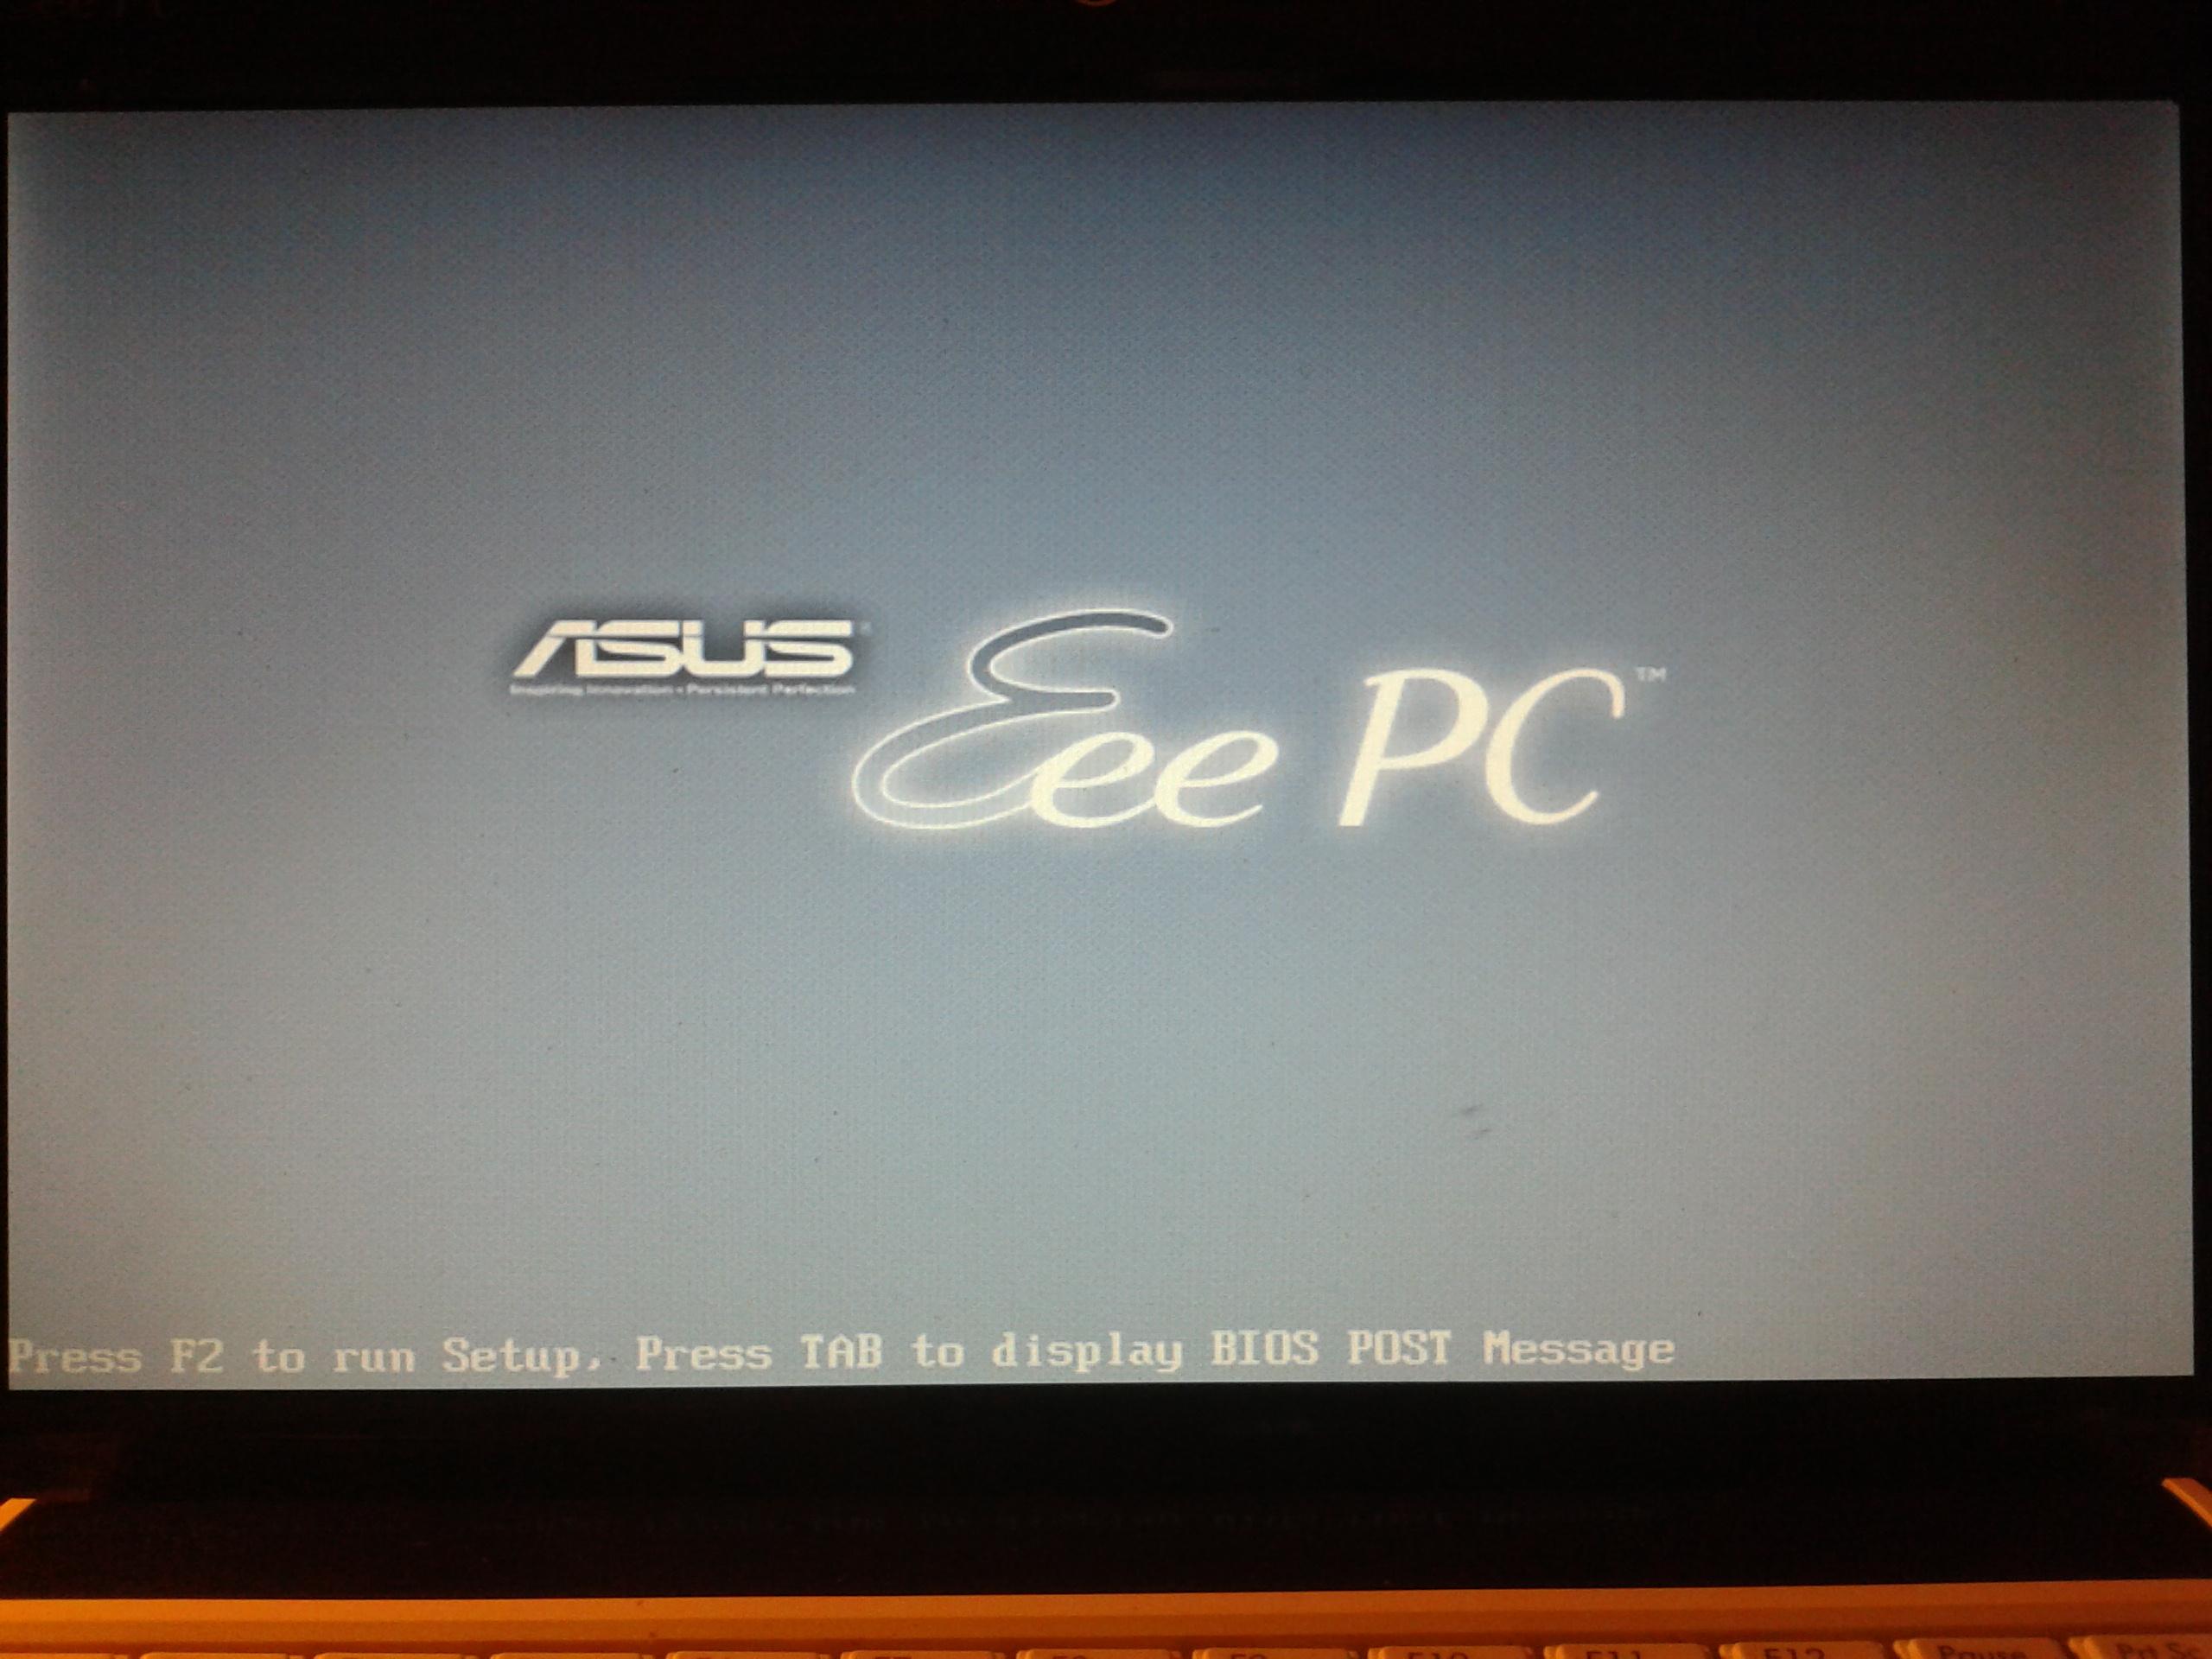 ASUS EEE PC 1005HAG 3G DRIVER WINDOWS XP